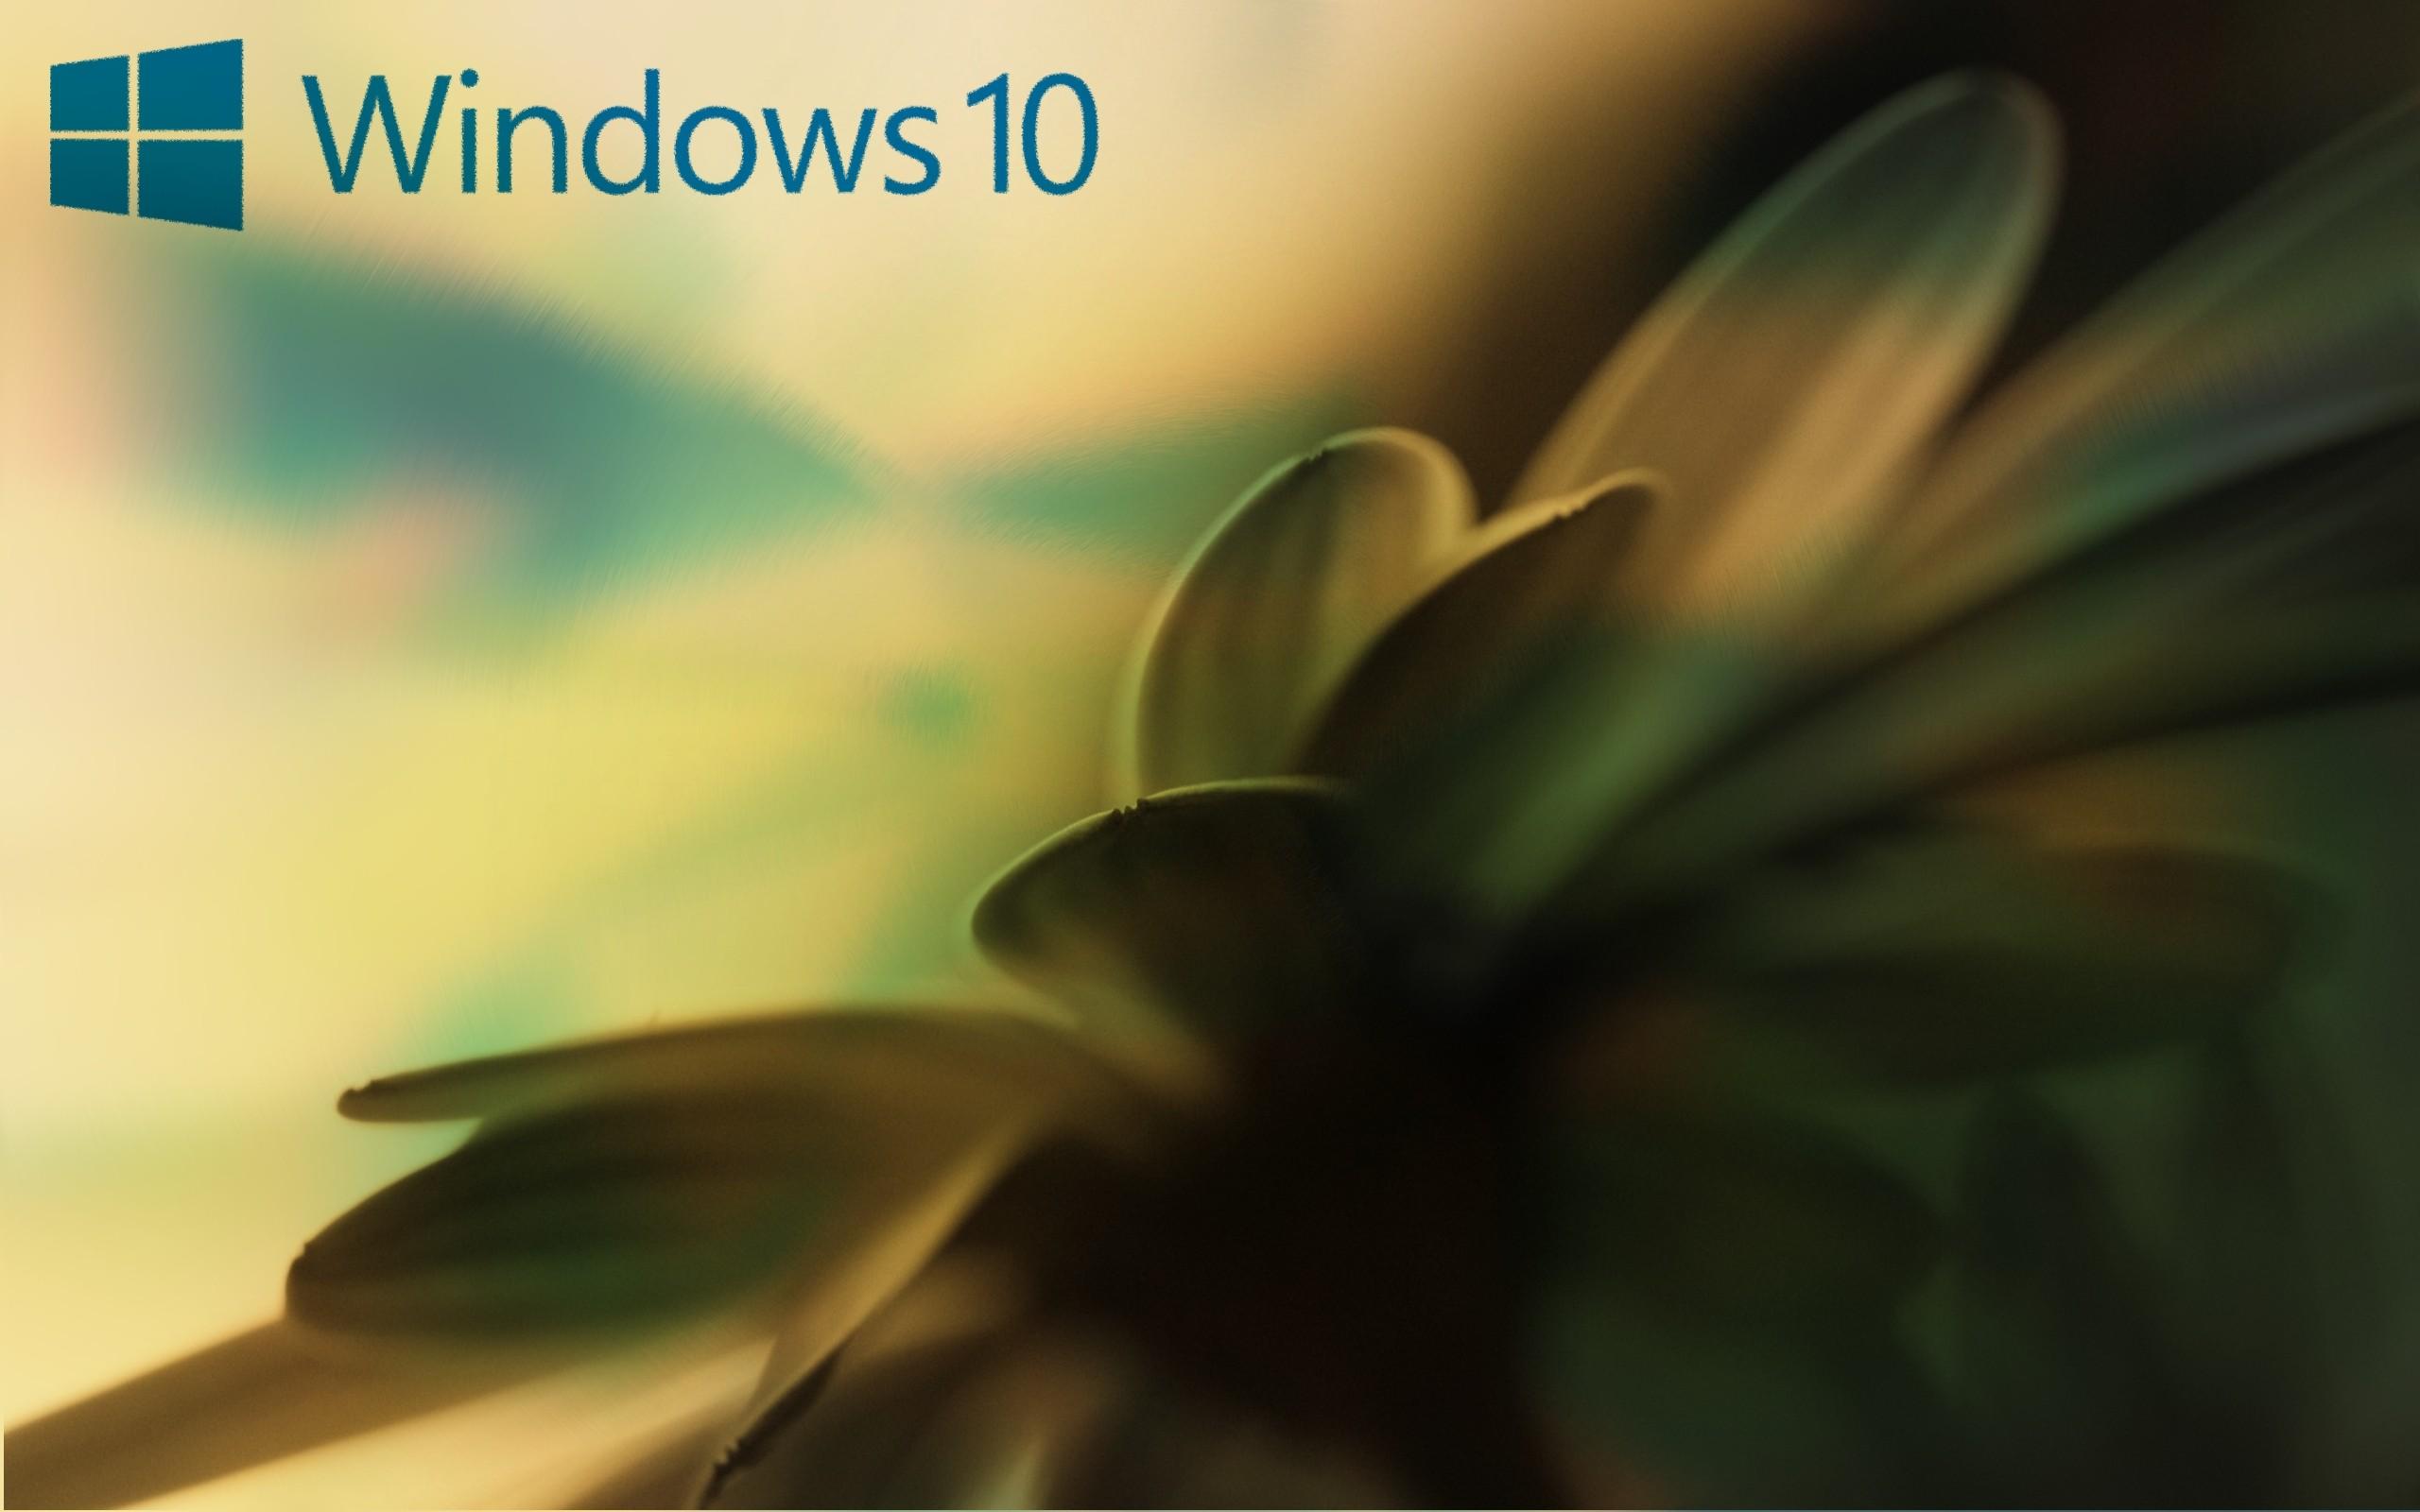 General 2560x1600 window Windows 10 Microsoft Windows Windows Vista MS-DOS flowers plants